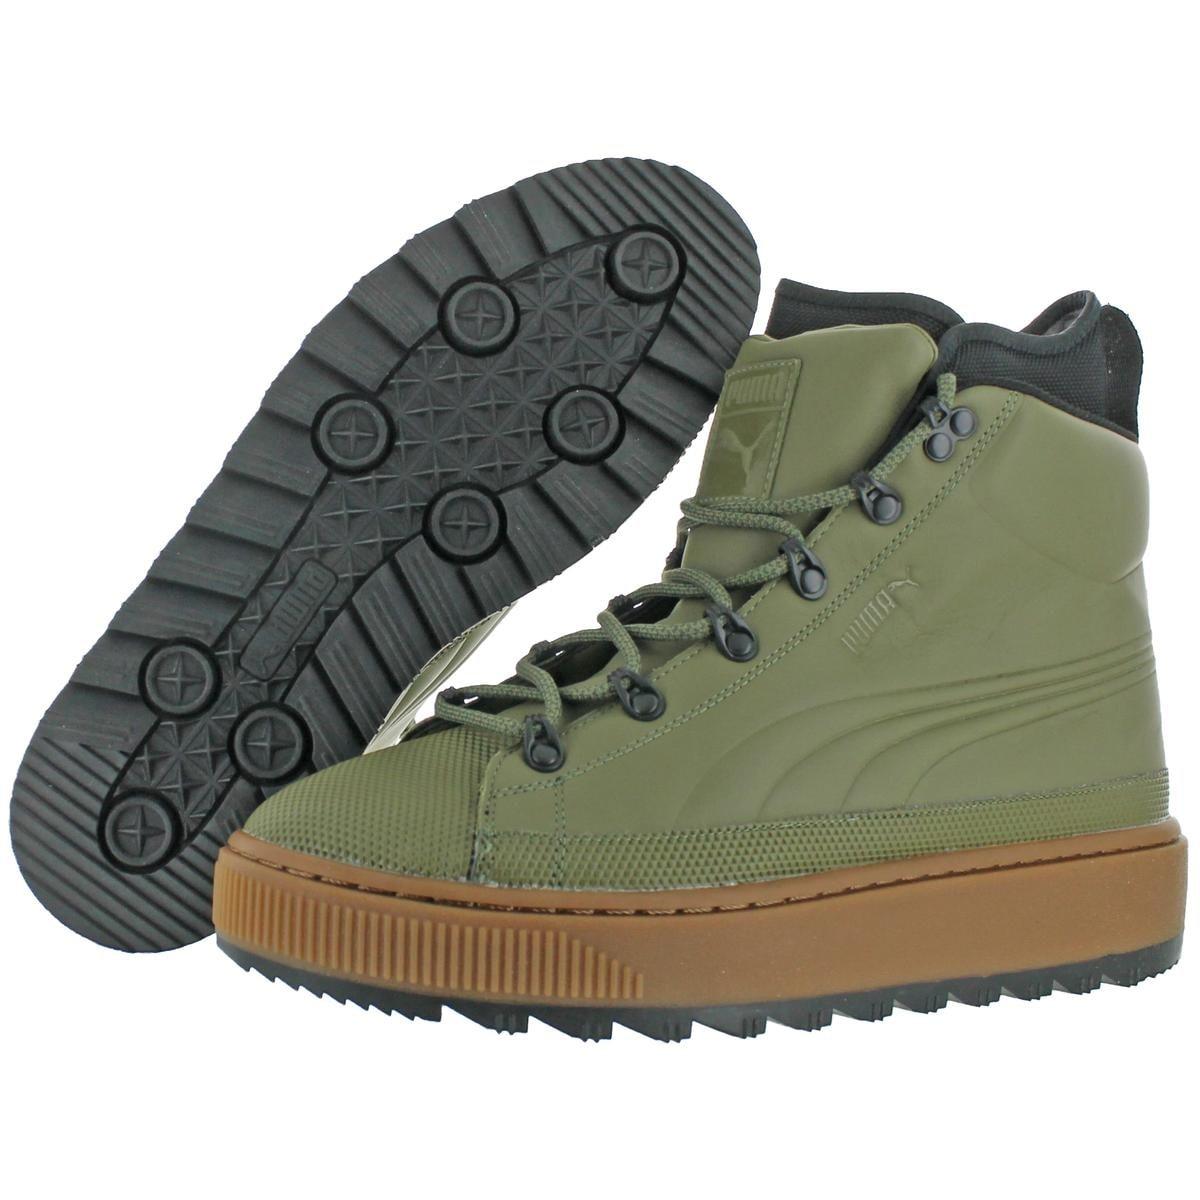 digestión facil de manejar cascada  Puma Mens The Ren Boot Casual Boots Water Resistant High-Top - Overstock -  22118780